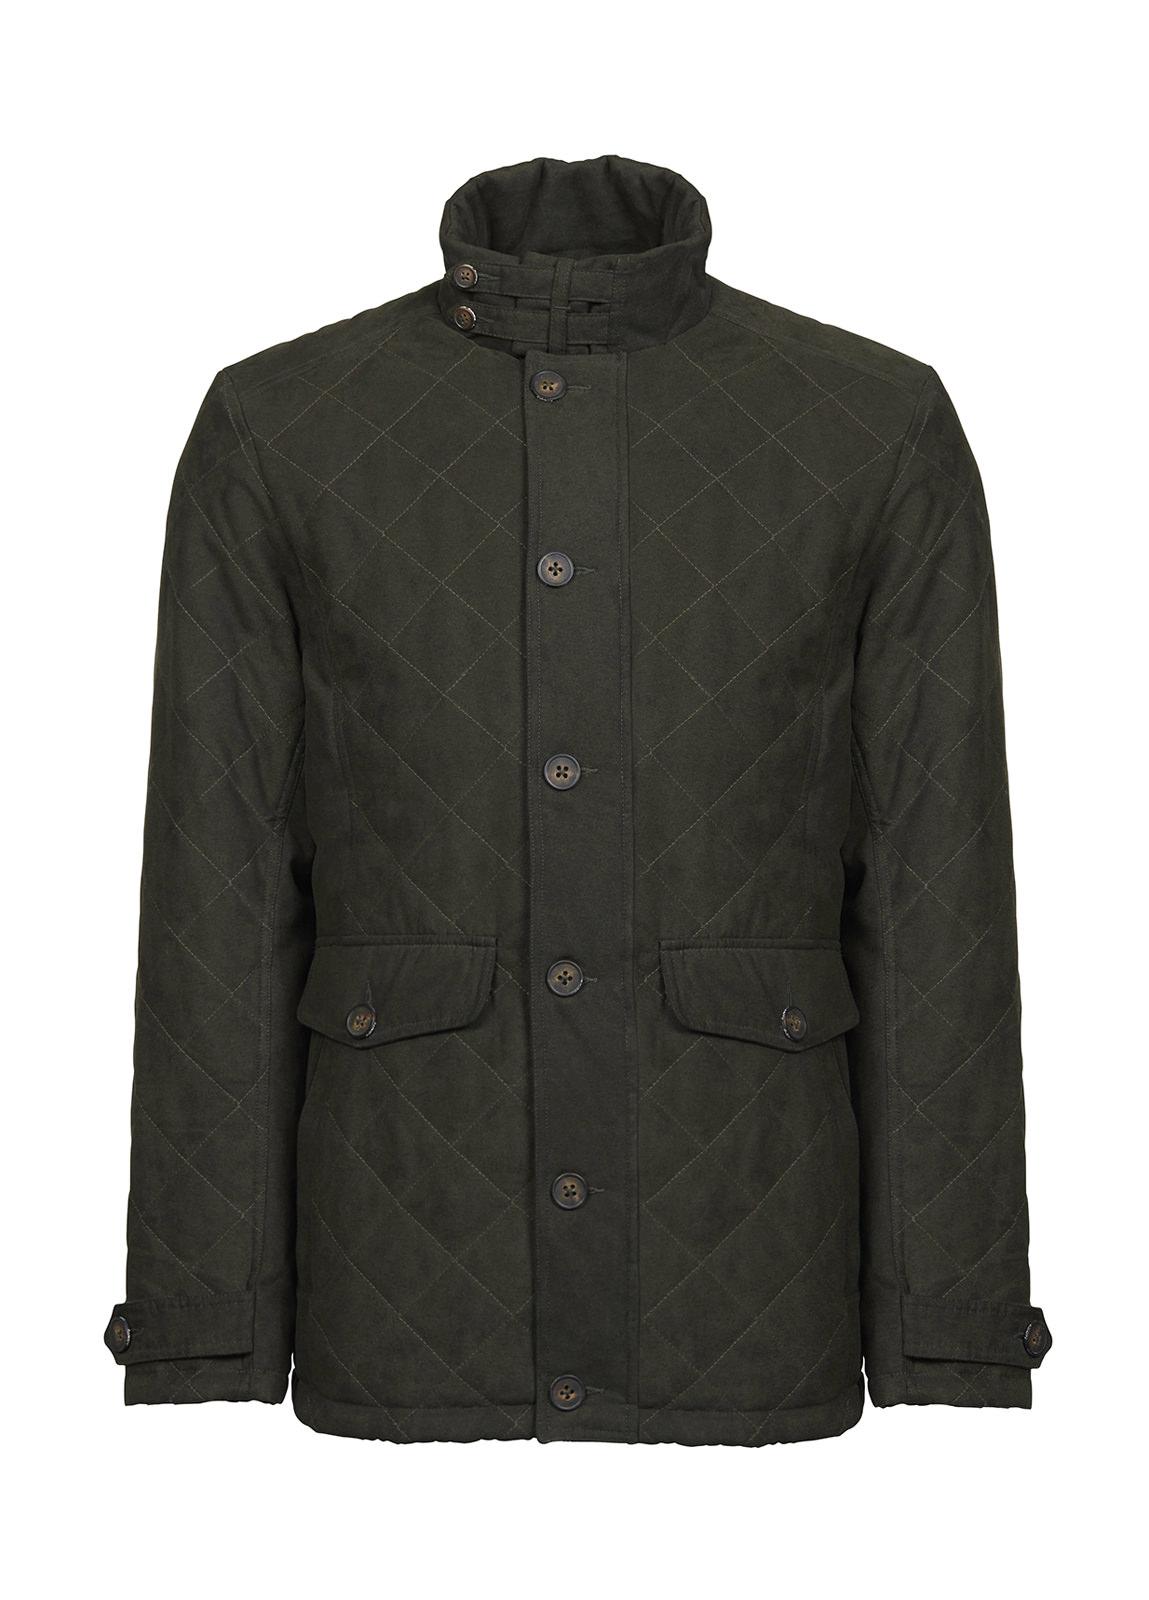 Dubarry_ Donovan Men's Jacket - Verdigris_Image_2